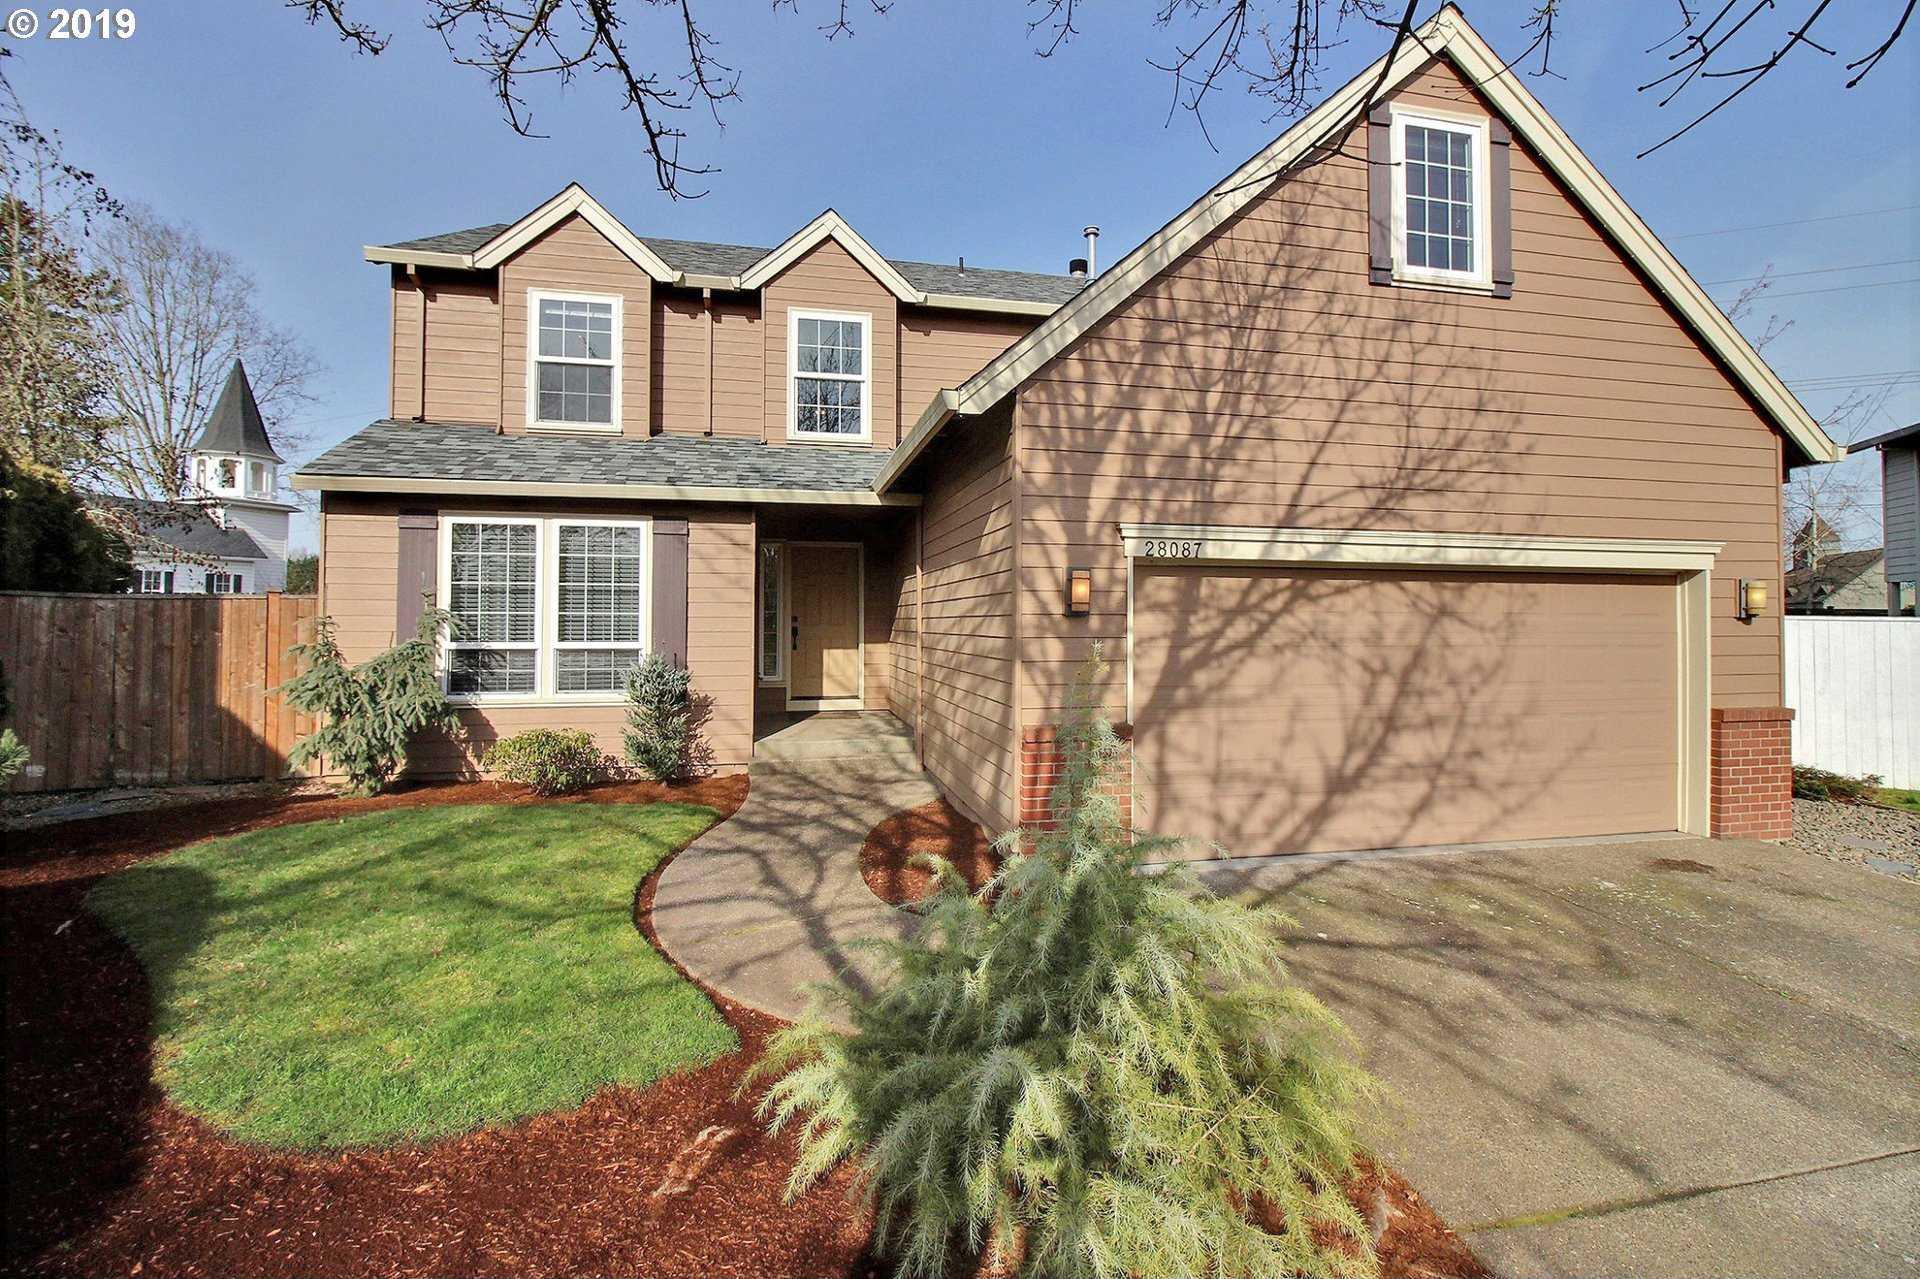 $495,000 - 4Br/3Ba -  for Sale in Landover, Wilsonville